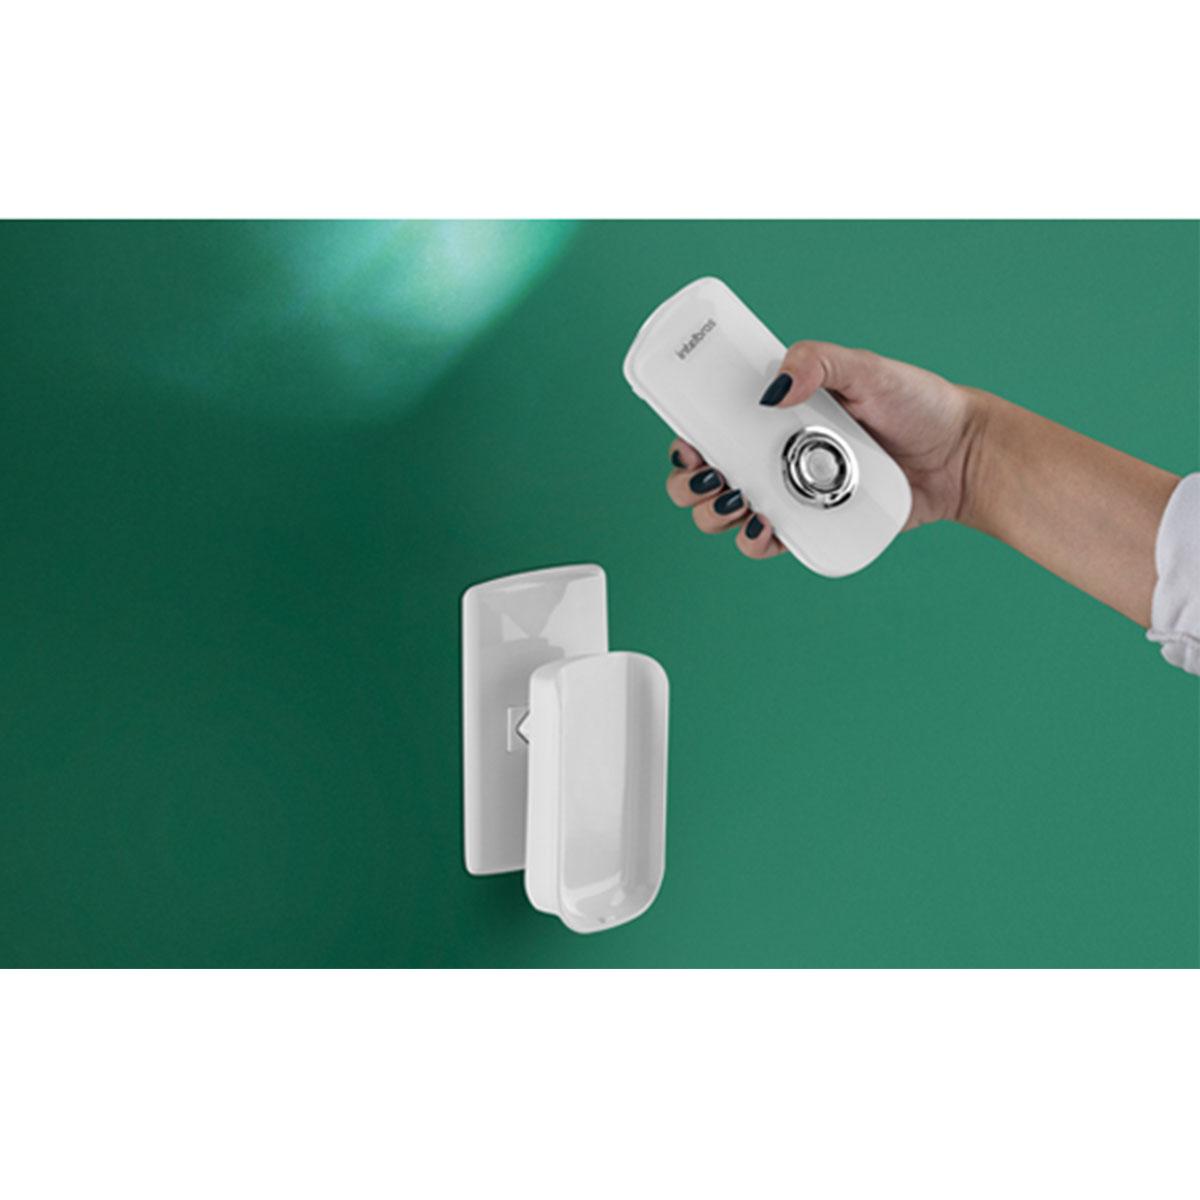 Kit 3 Luminária Intelbras Led c/ Sensor De Presença Esi 5003